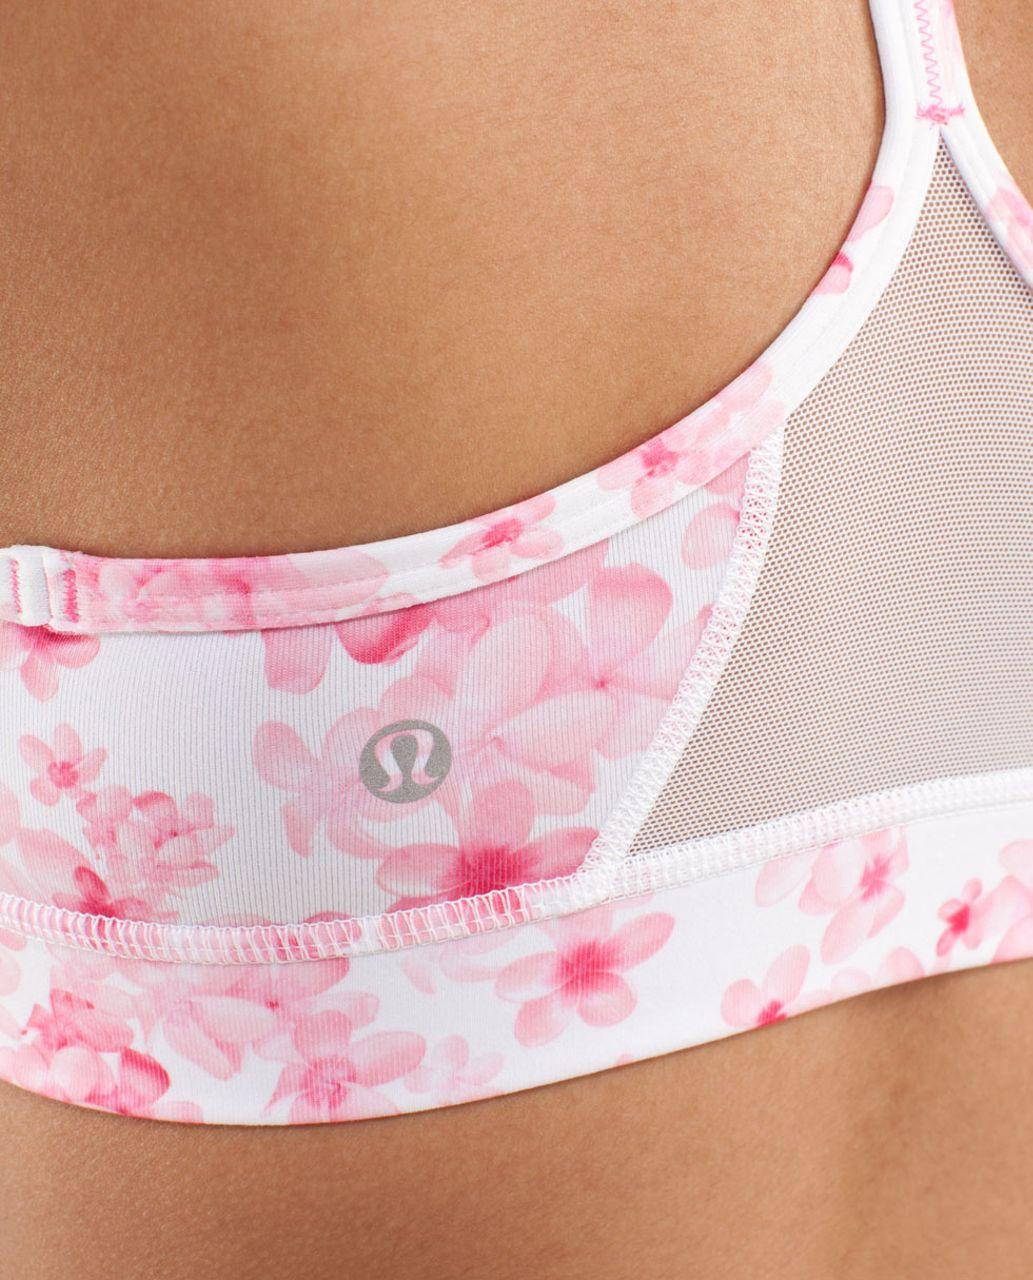 Lululemon Flow Y Bra IV - Frangipani Parfait Pink / White